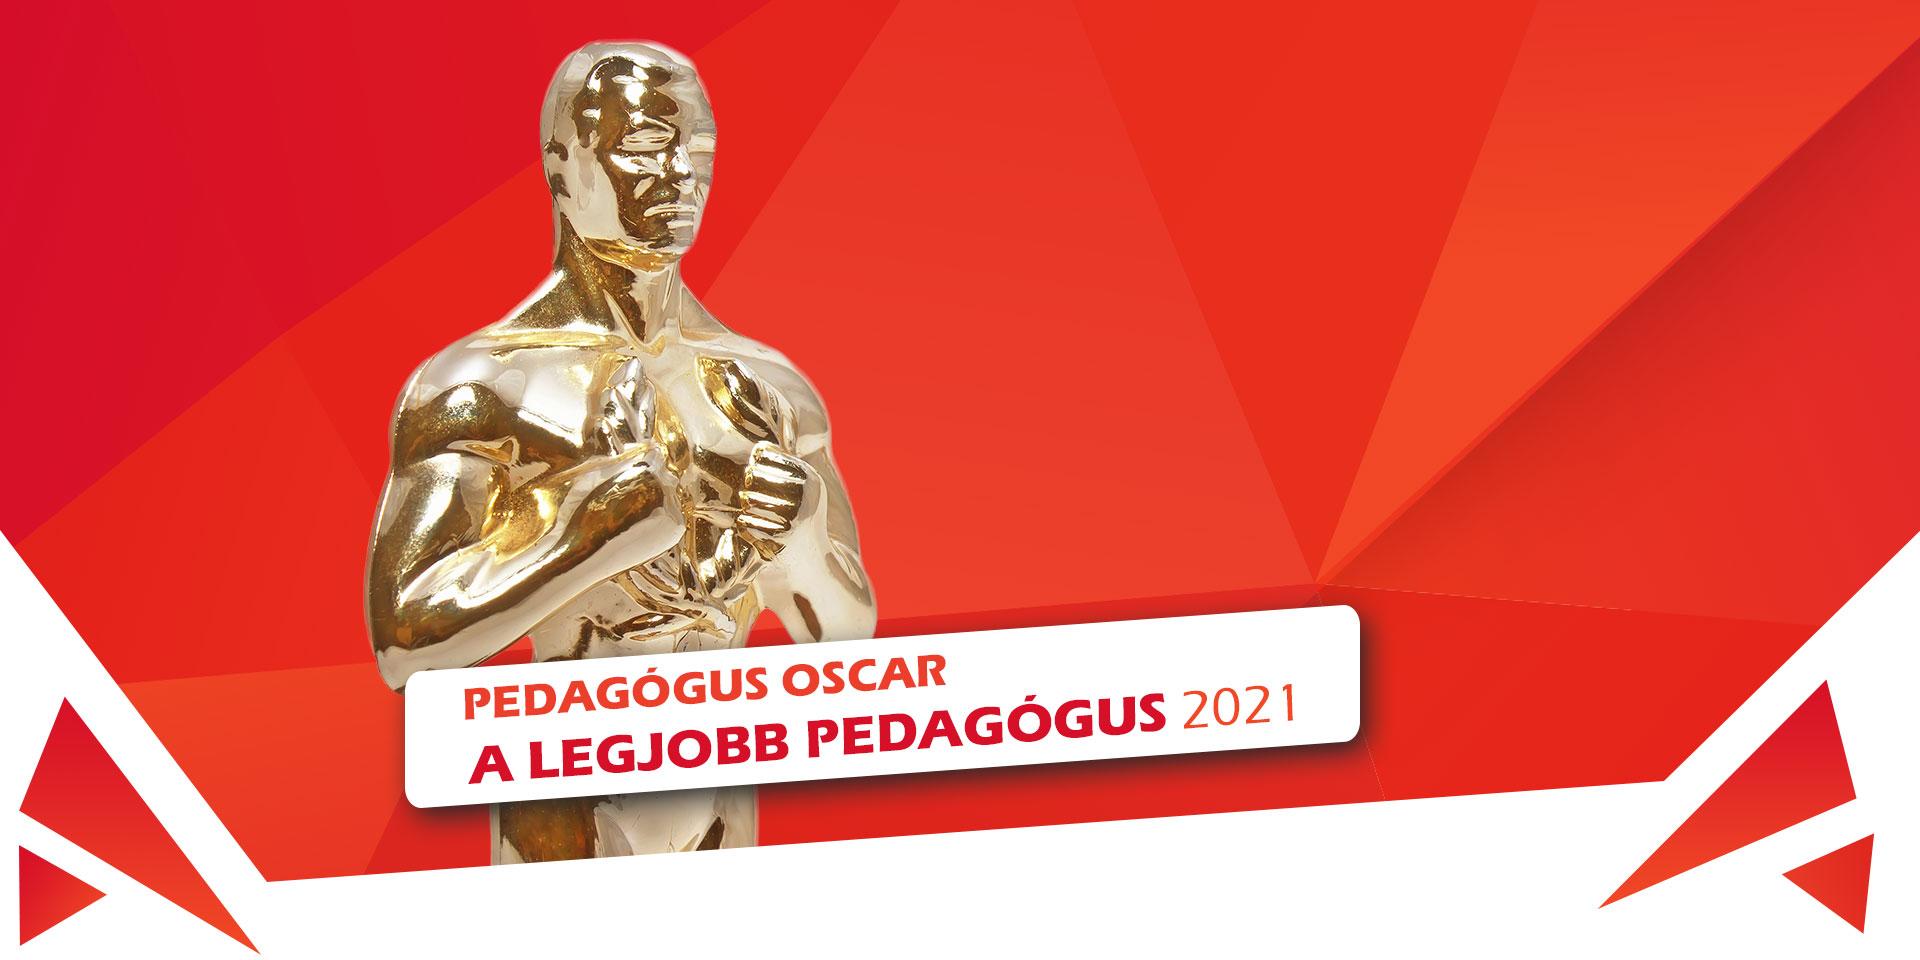 legjobbpedagogus_header_2021